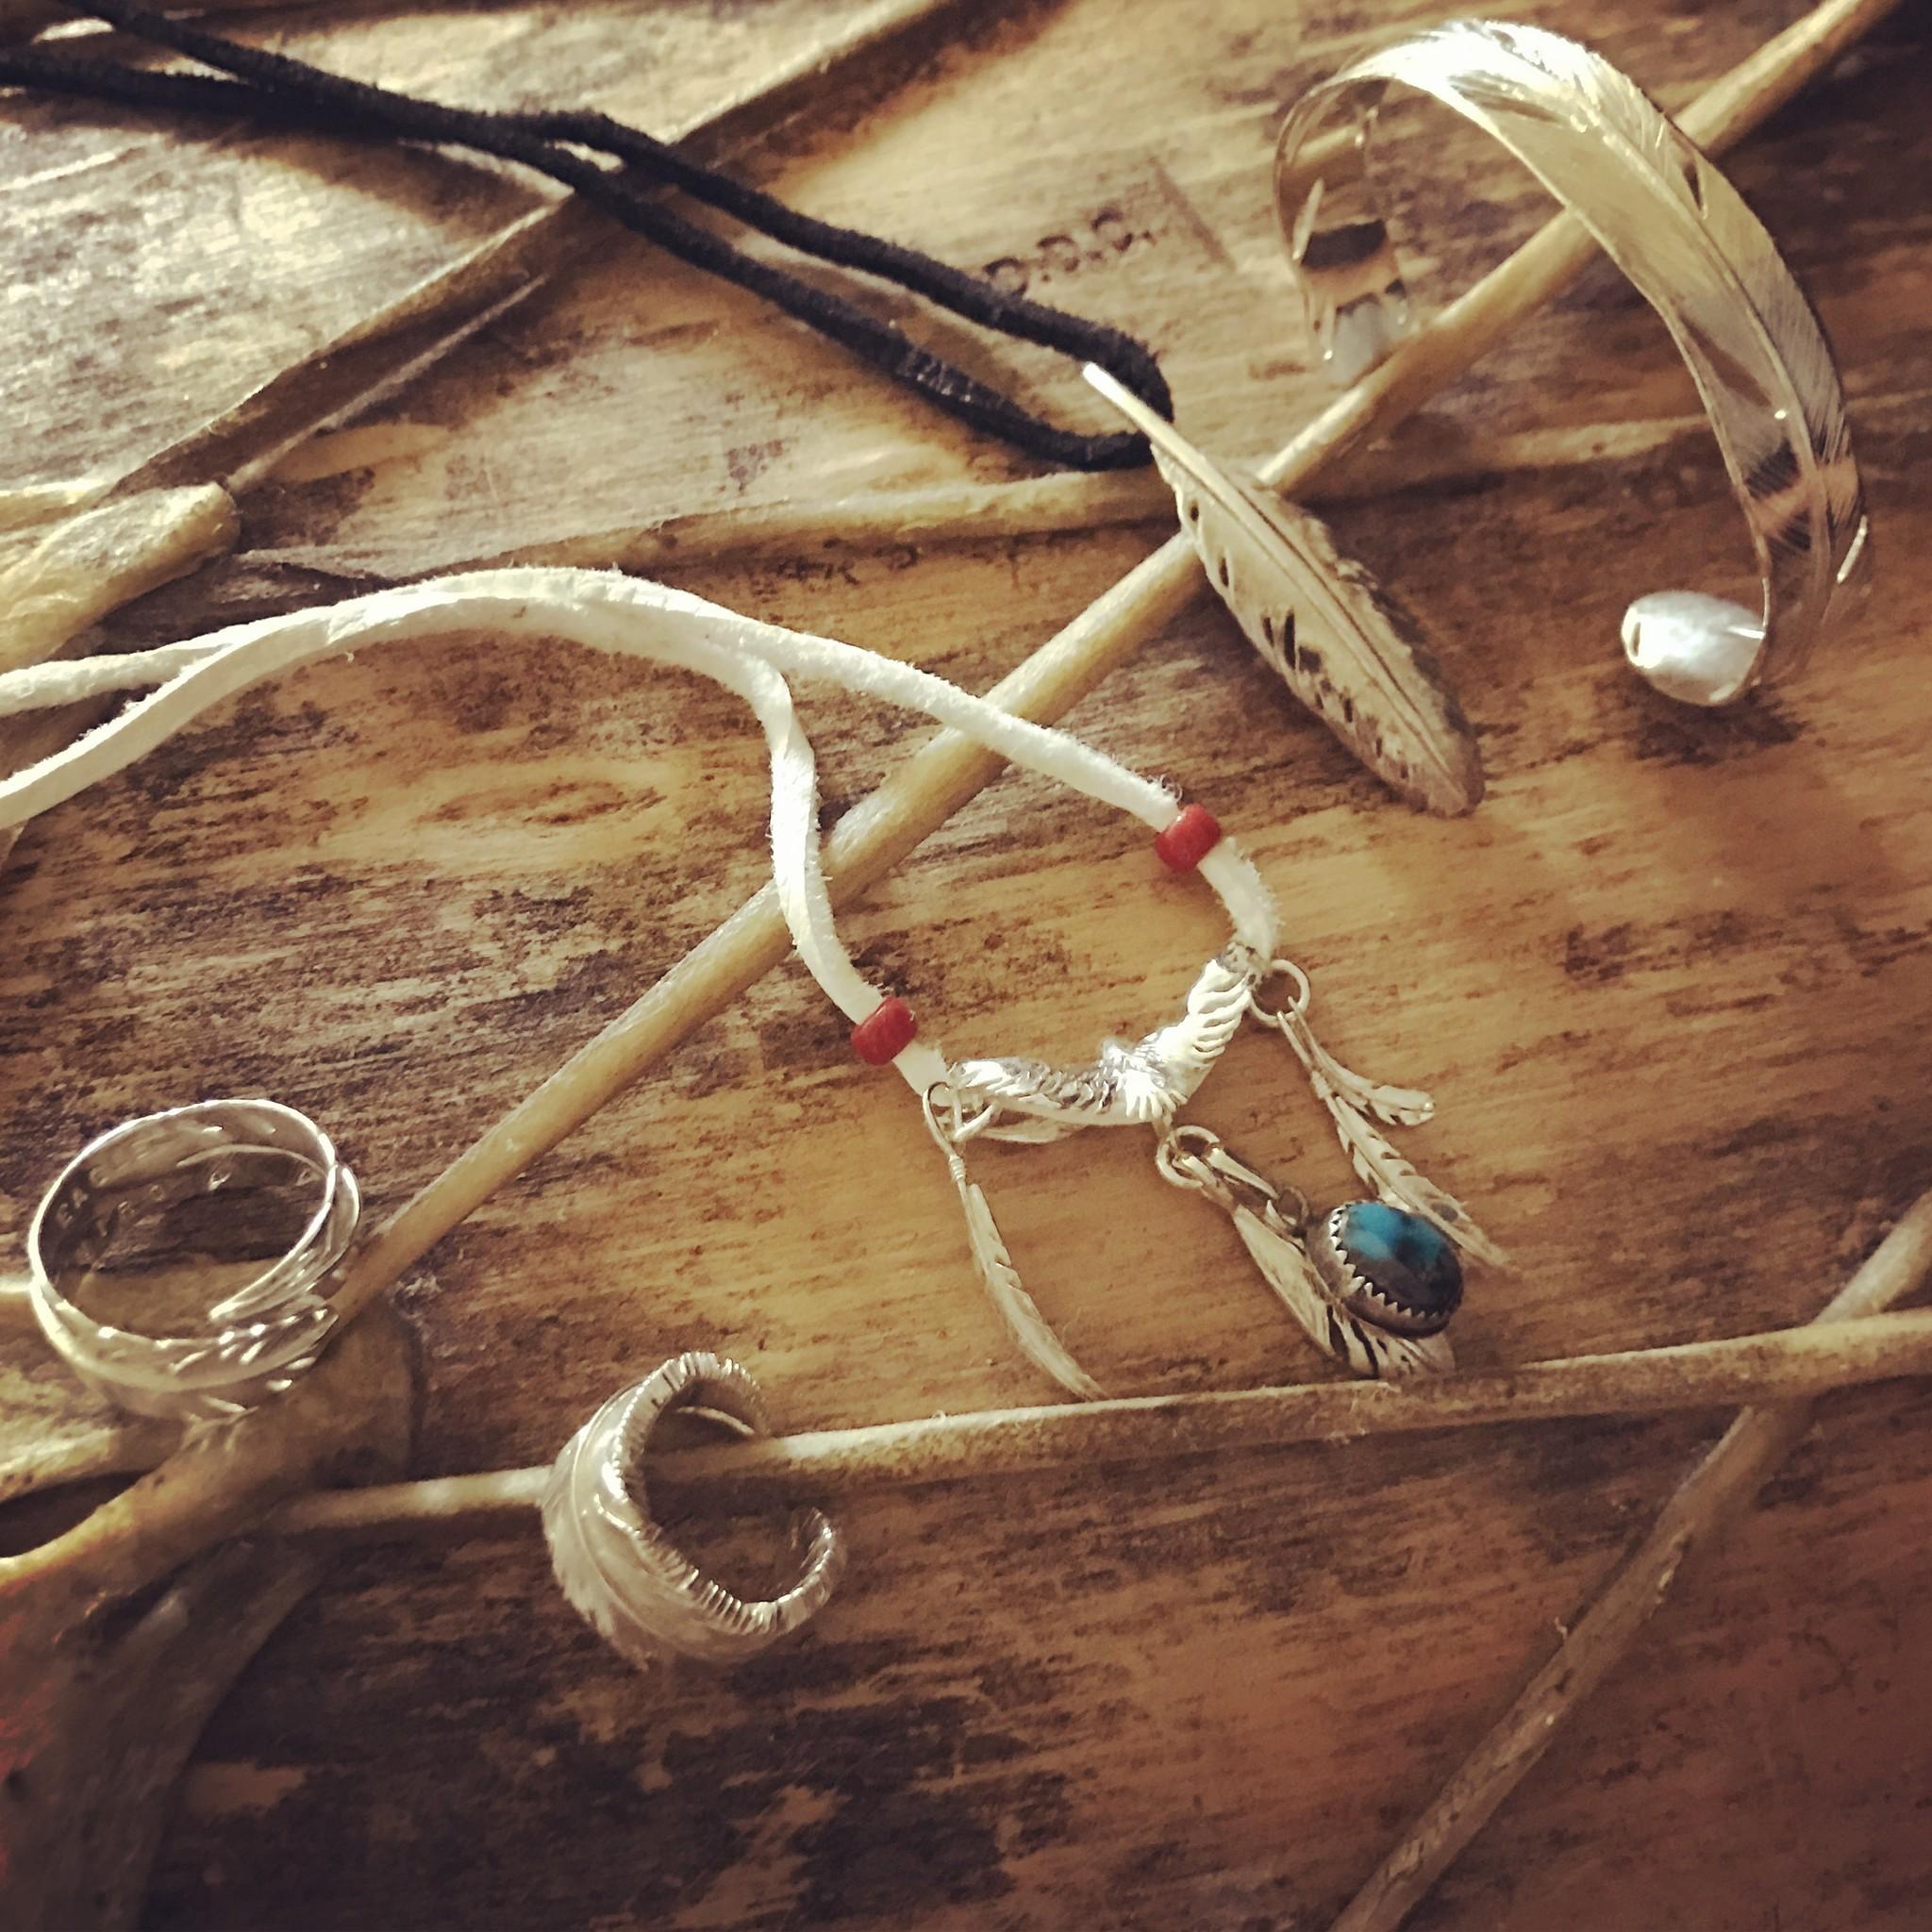 jewelry pv♪→ https://youtu.be/1QfcmQ0-kF8